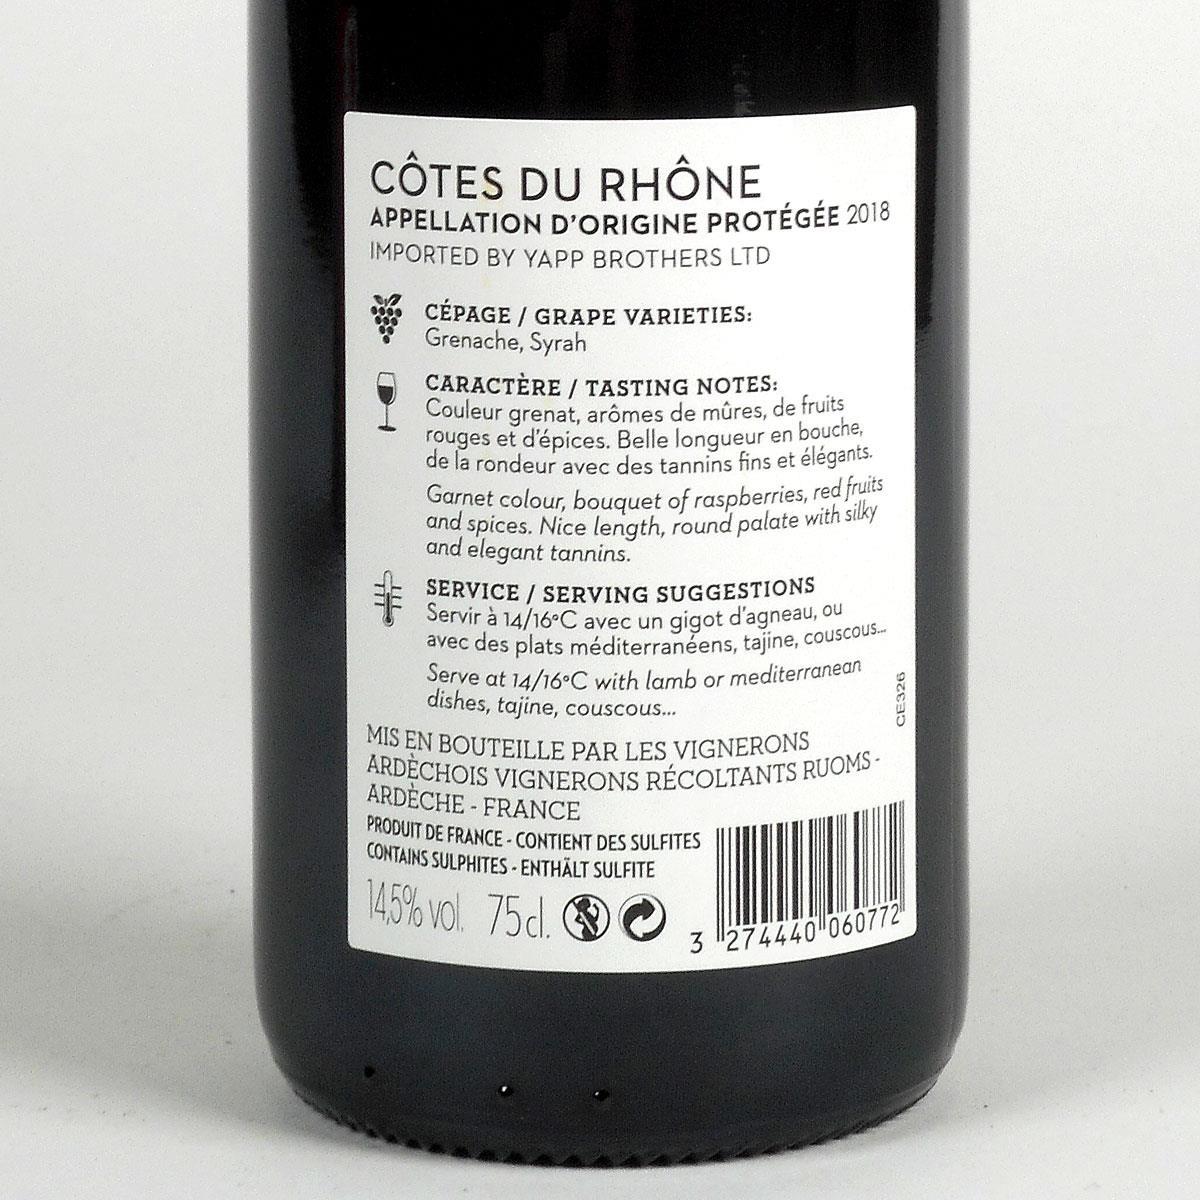 Yapp Côtes du Rhône Red 2018 - Bottle Rear Label